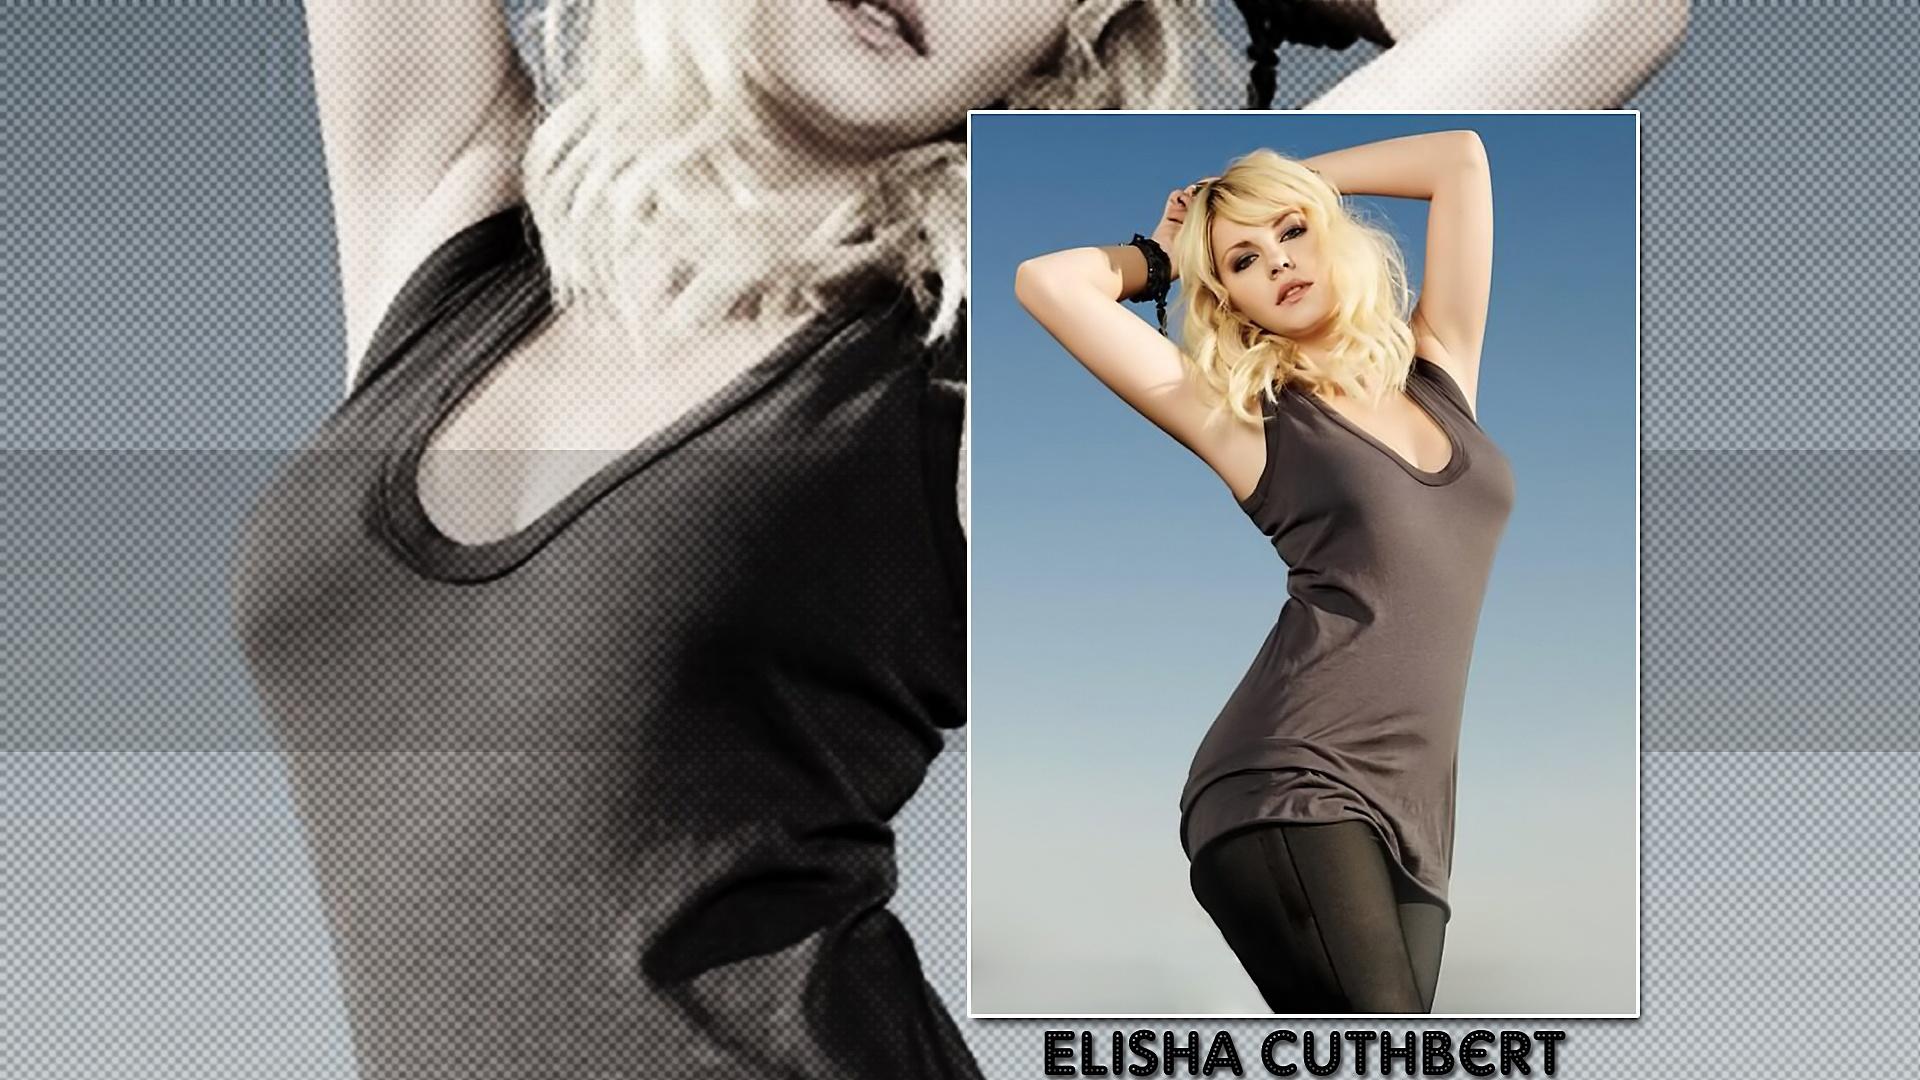 elisha cuthbert wallpapers hd A3